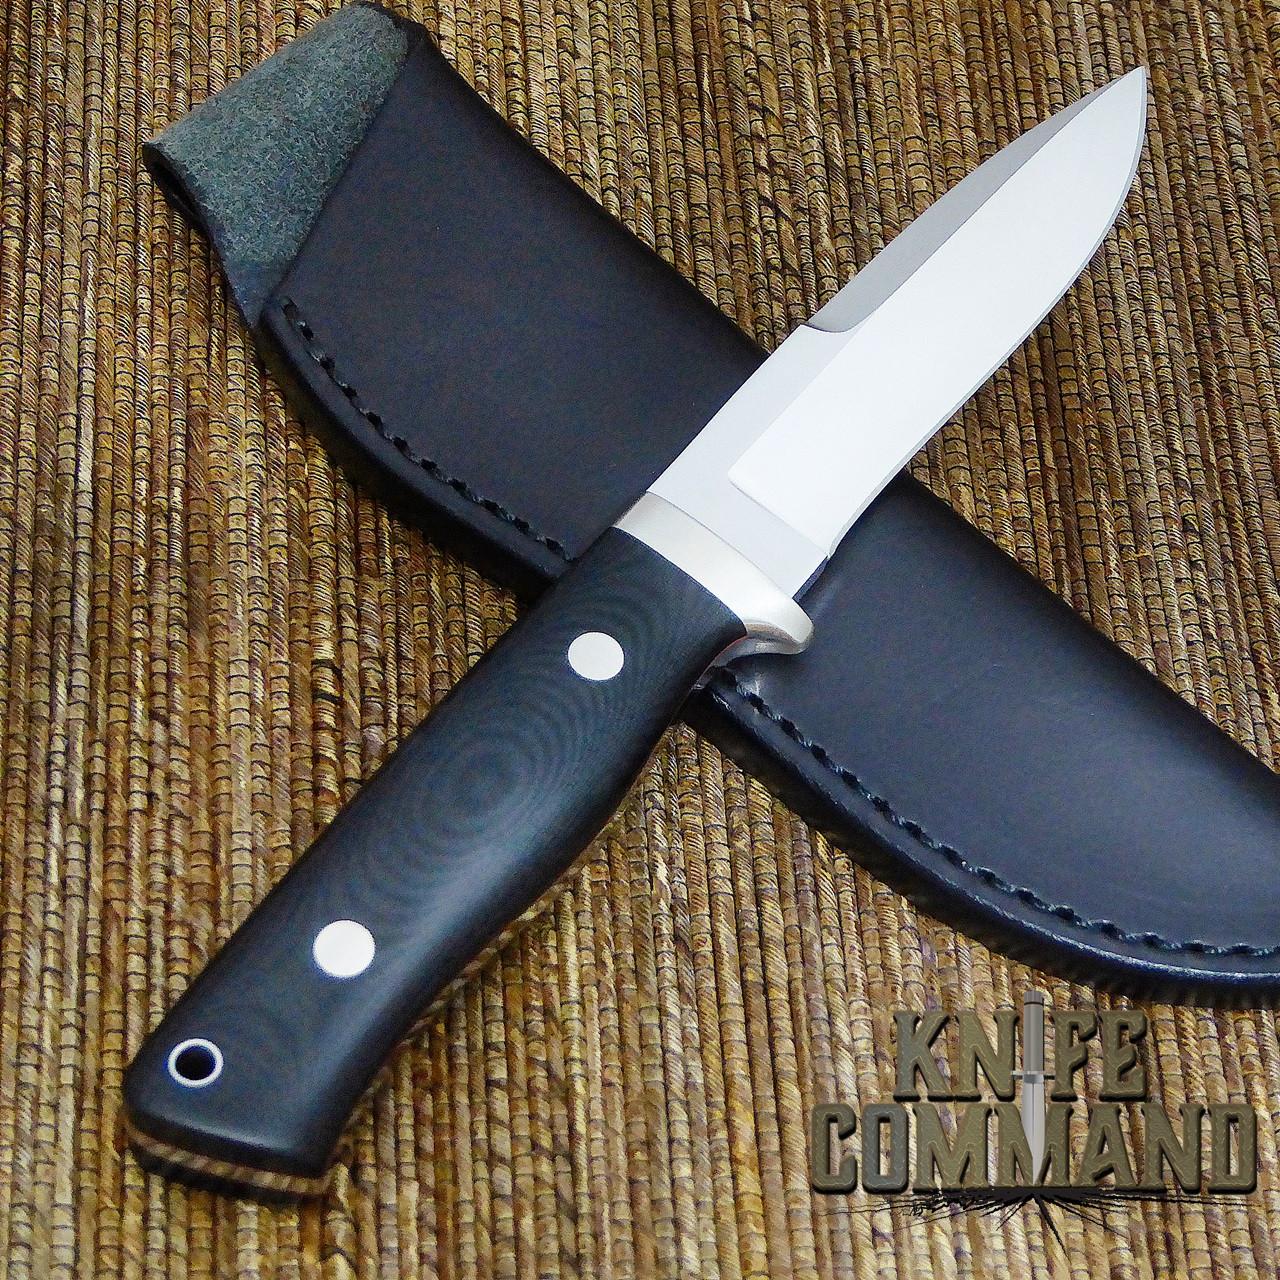 Hattori Knives Dream Hunter Ht-05 Red Hunting Knife.  Nickel Silver hardware.